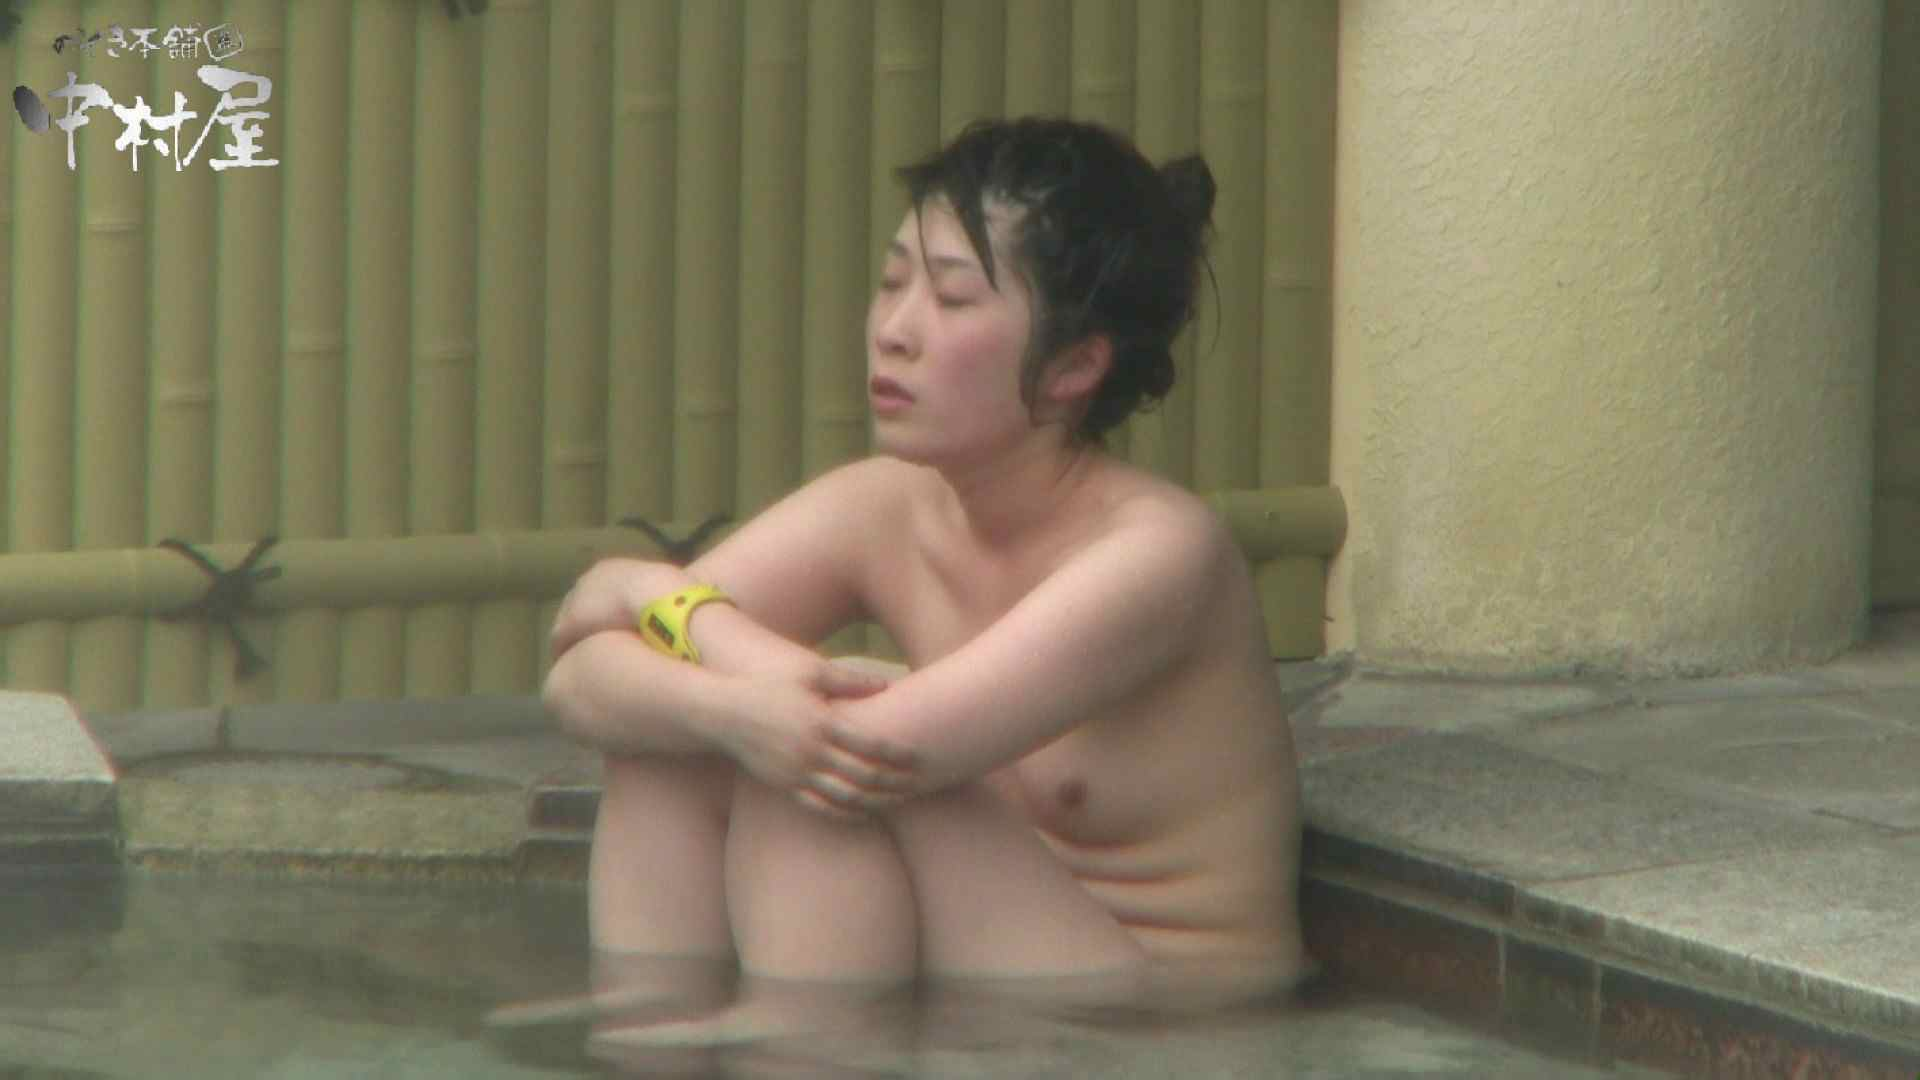 Aquaな露天風呂Vol.955 盗撮師作品 | 露天風呂突入  85pic 52